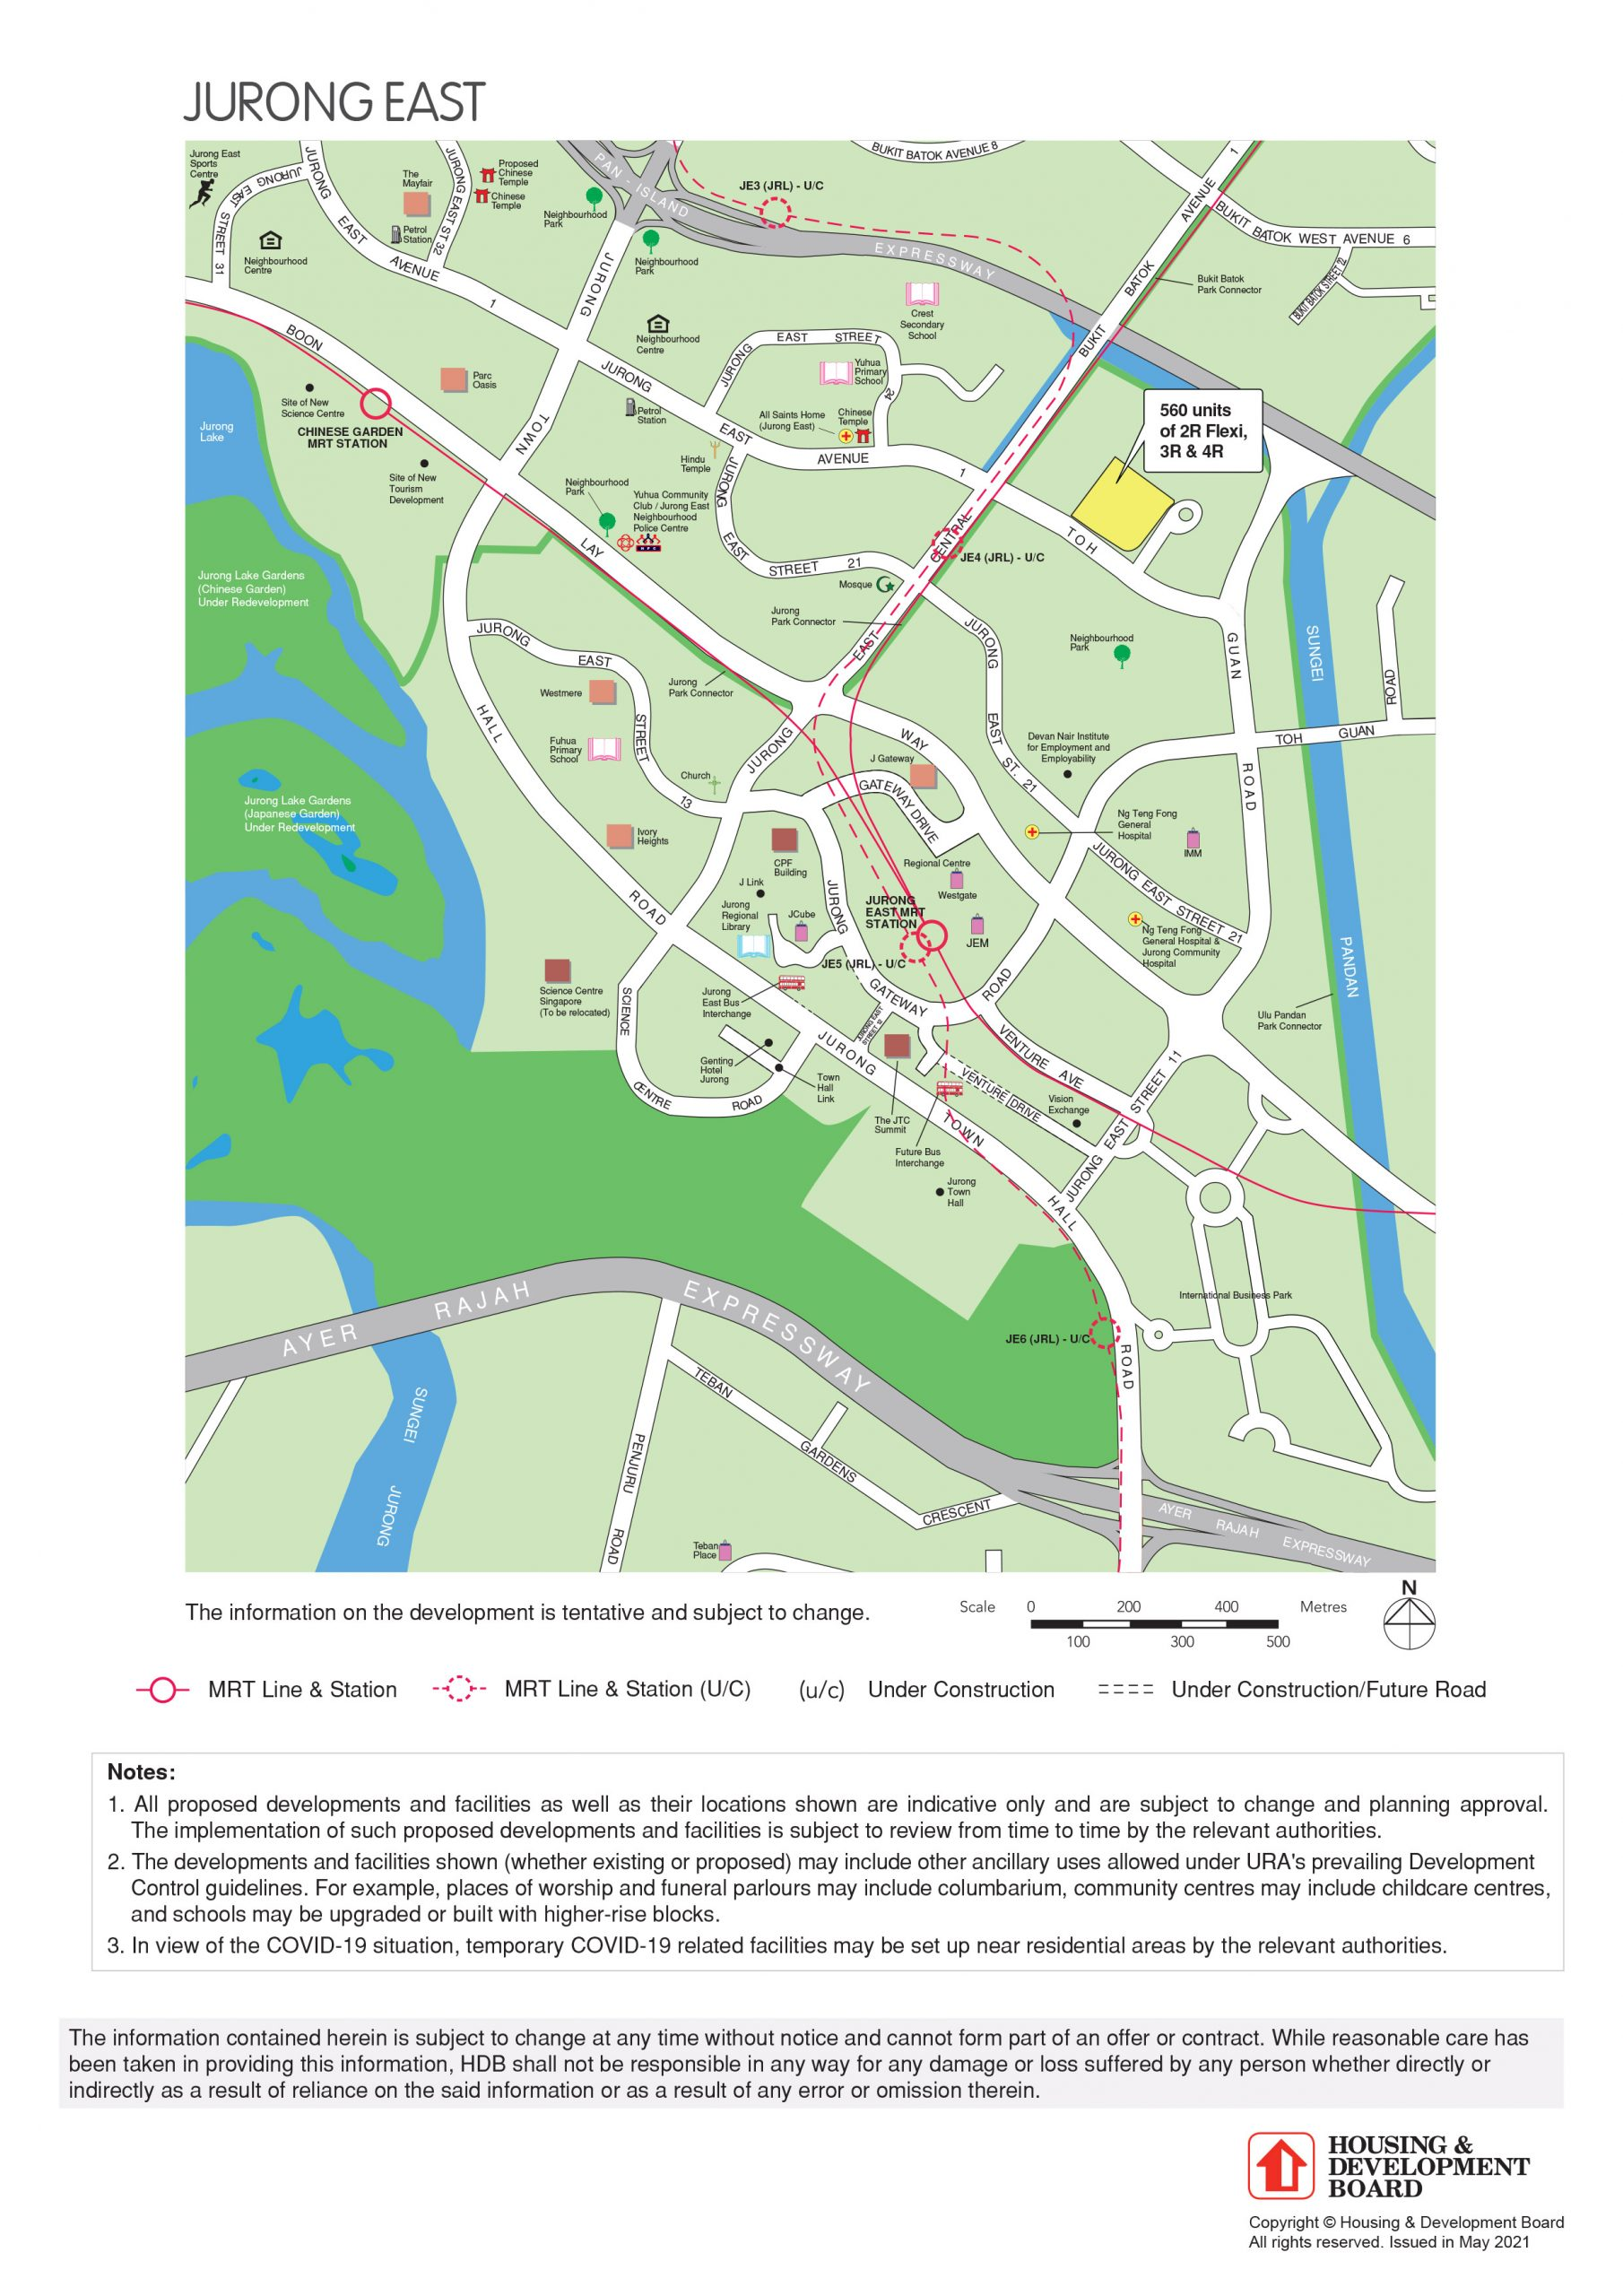 Full map of August 2021 Jurong East BTO